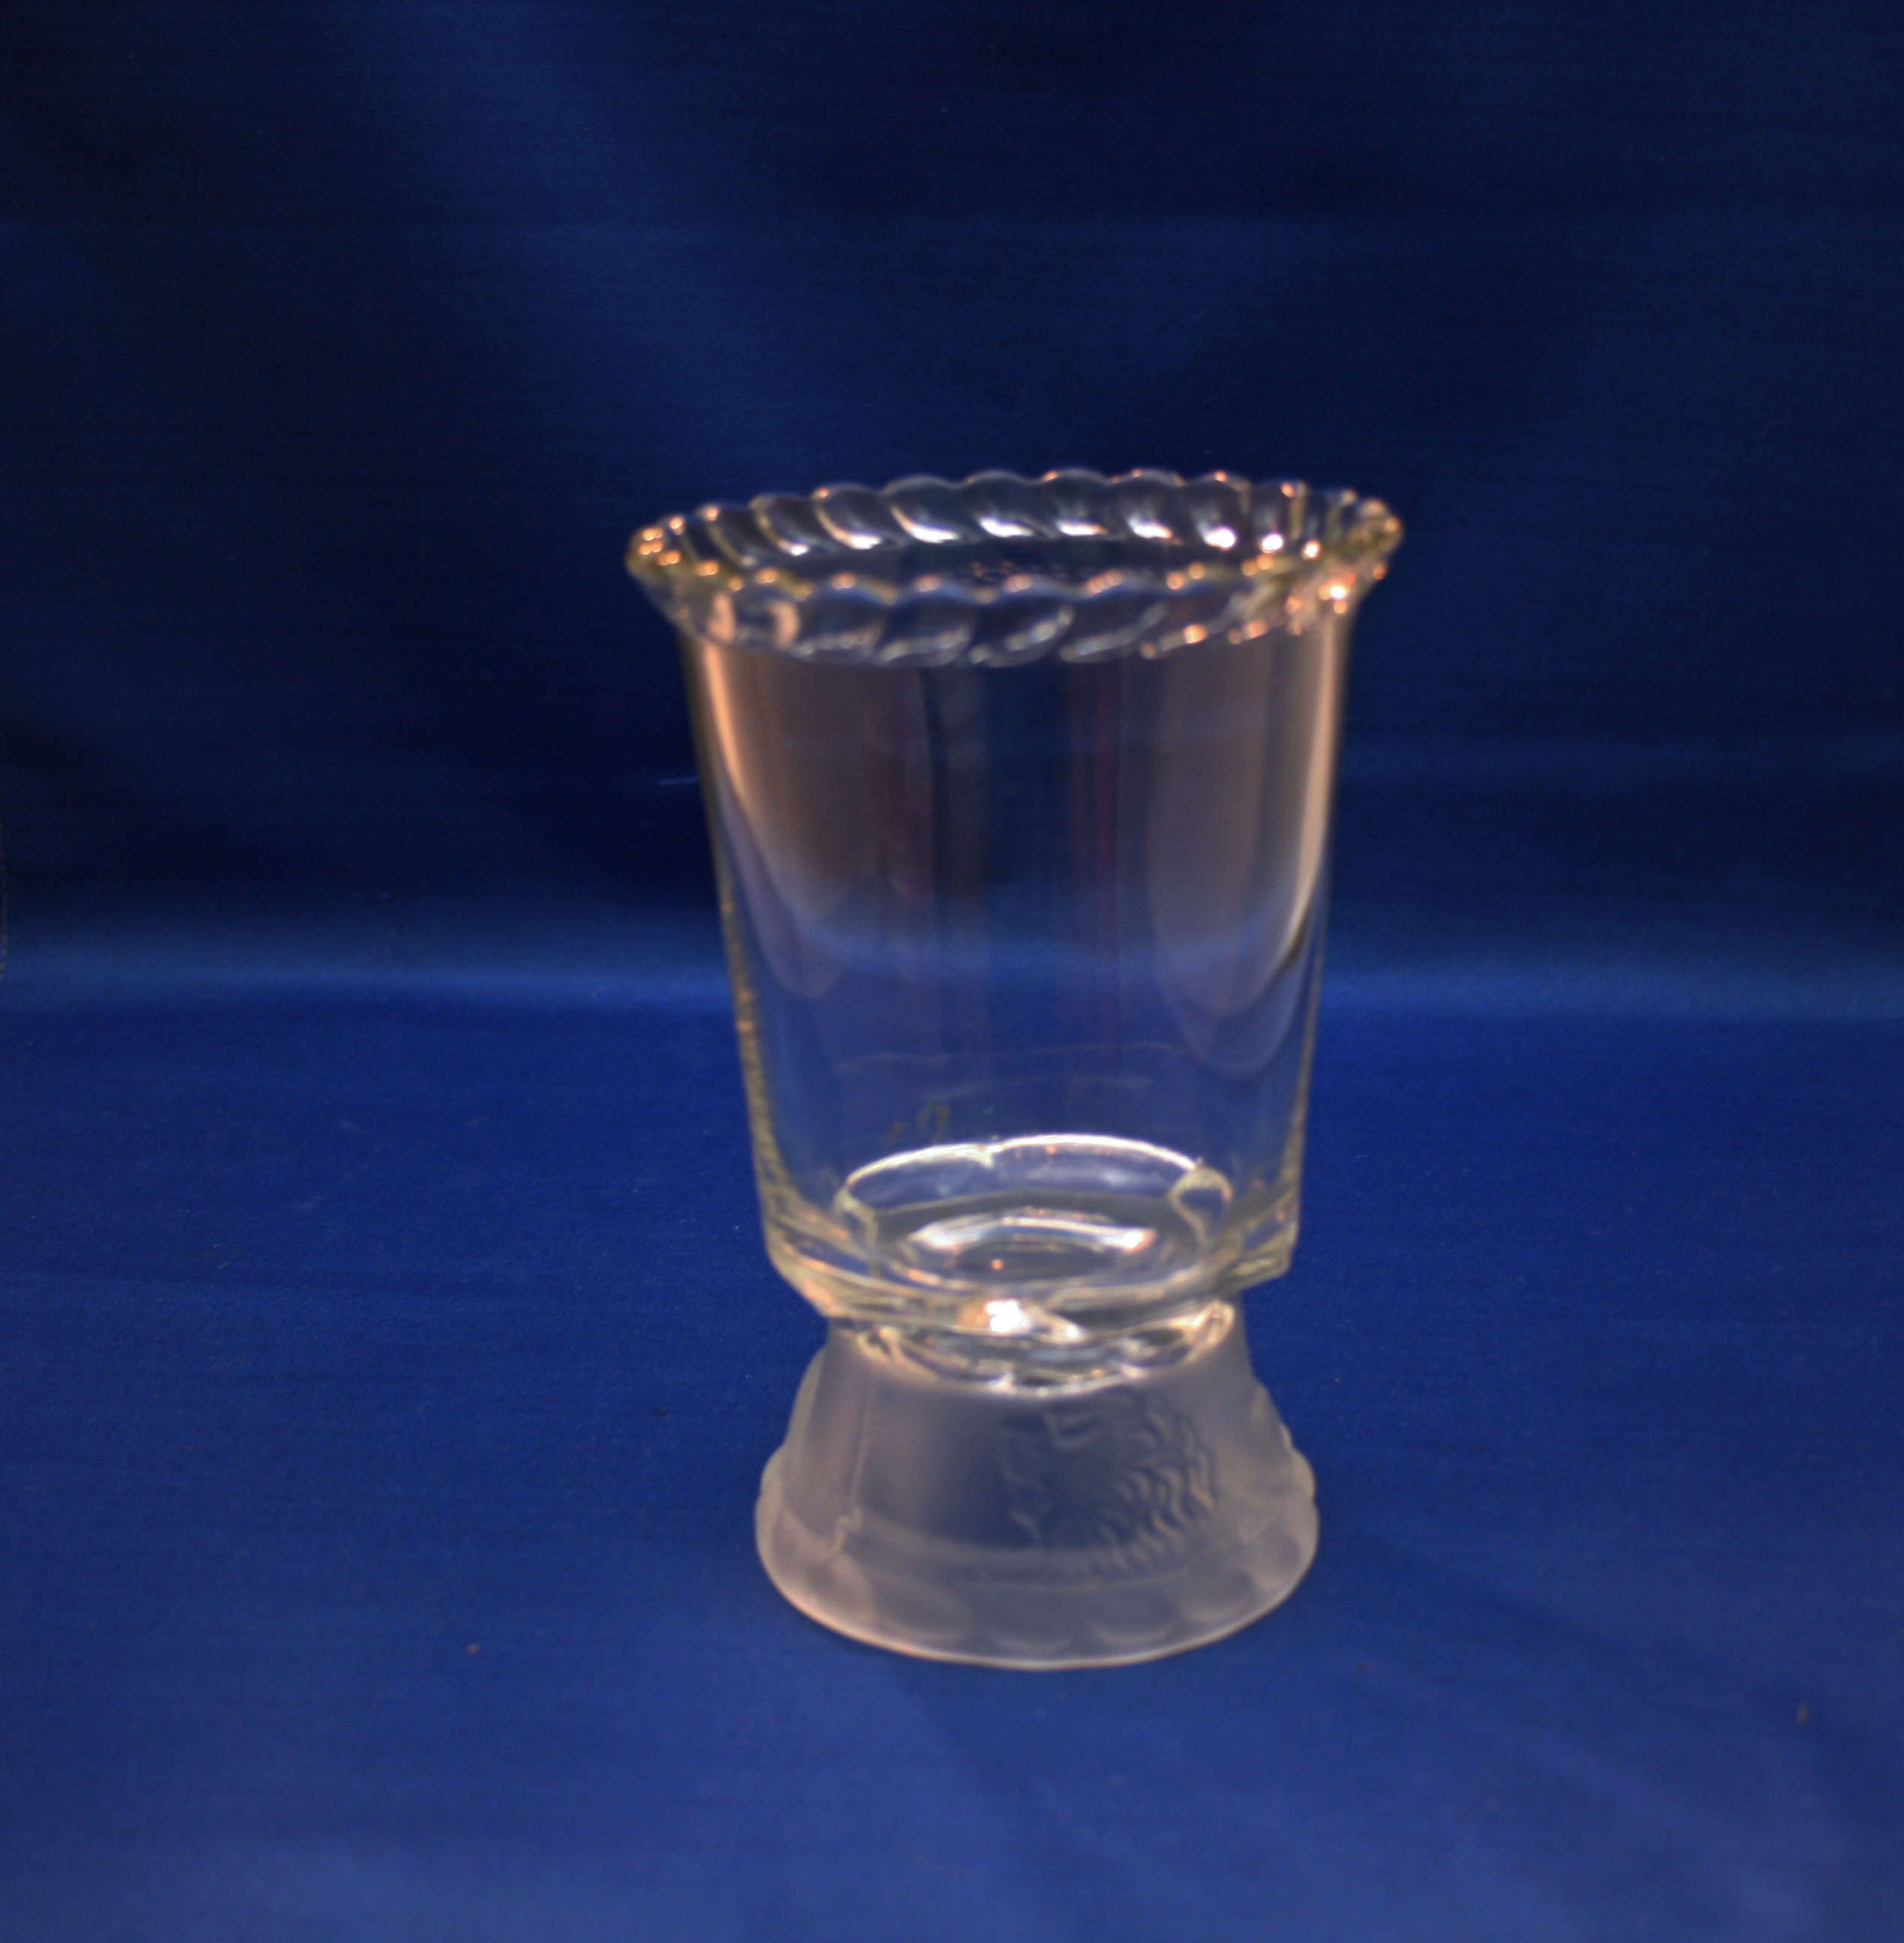 lenox crystal vase of antique eapg gillinder and sons frosted lions spooner circa 1876 regarding visit